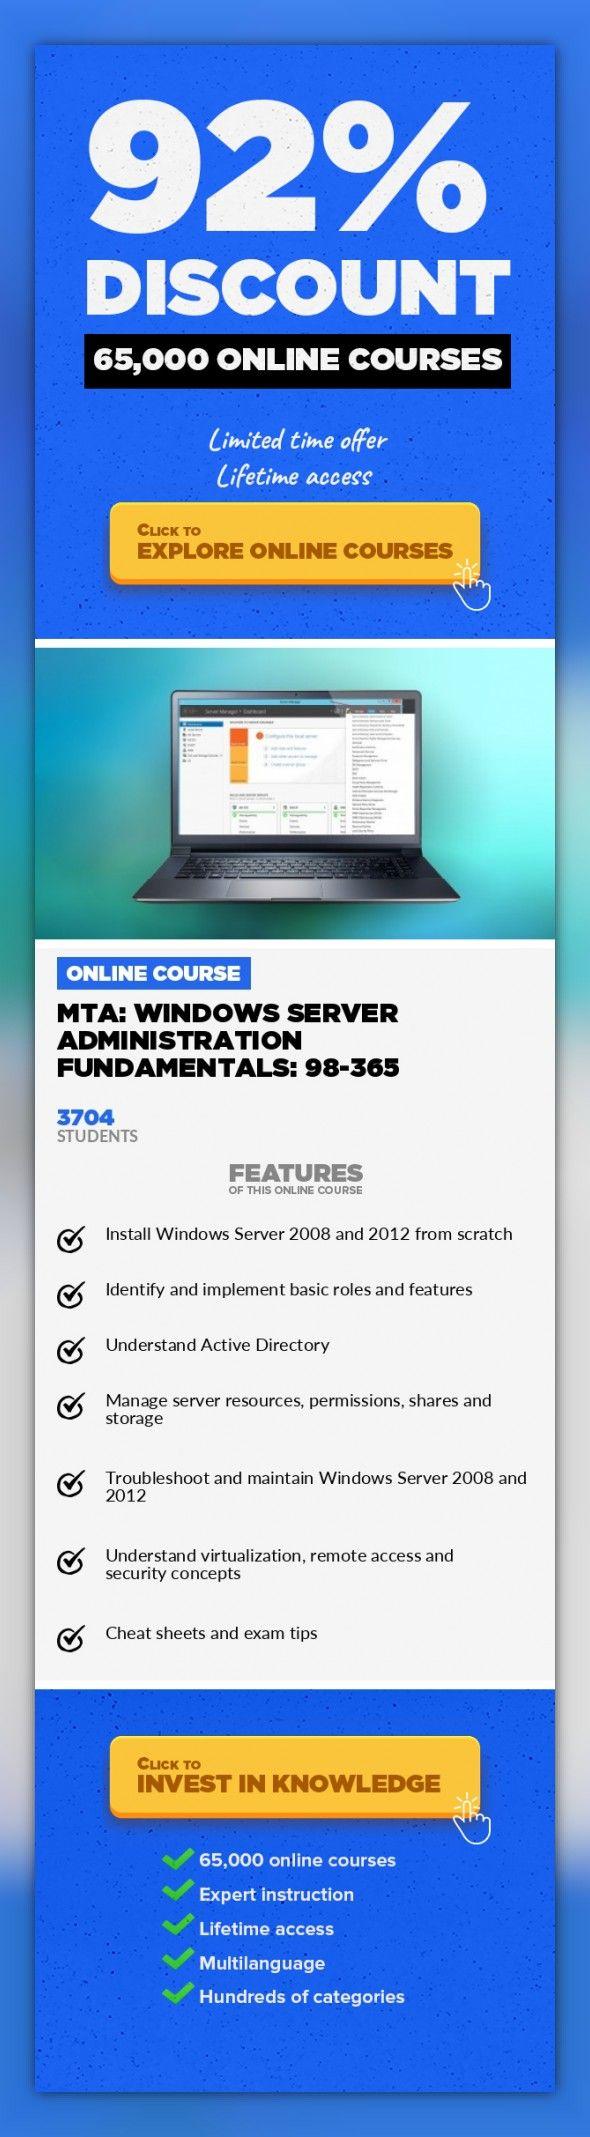 Mta Windows Server Administration Fundamentals 98 365 It